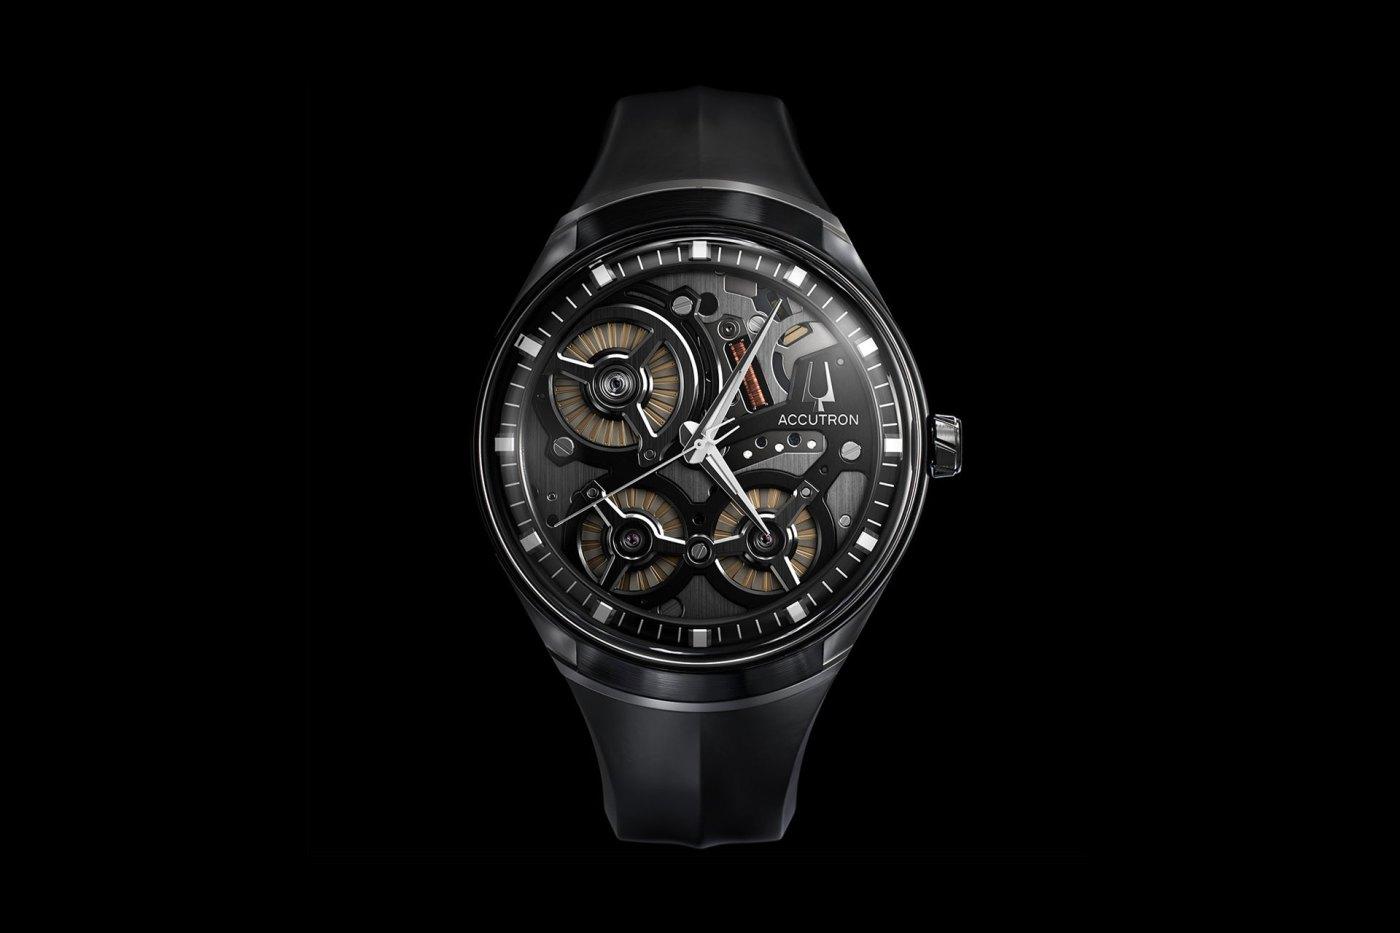 2020 Accutron DNA watch